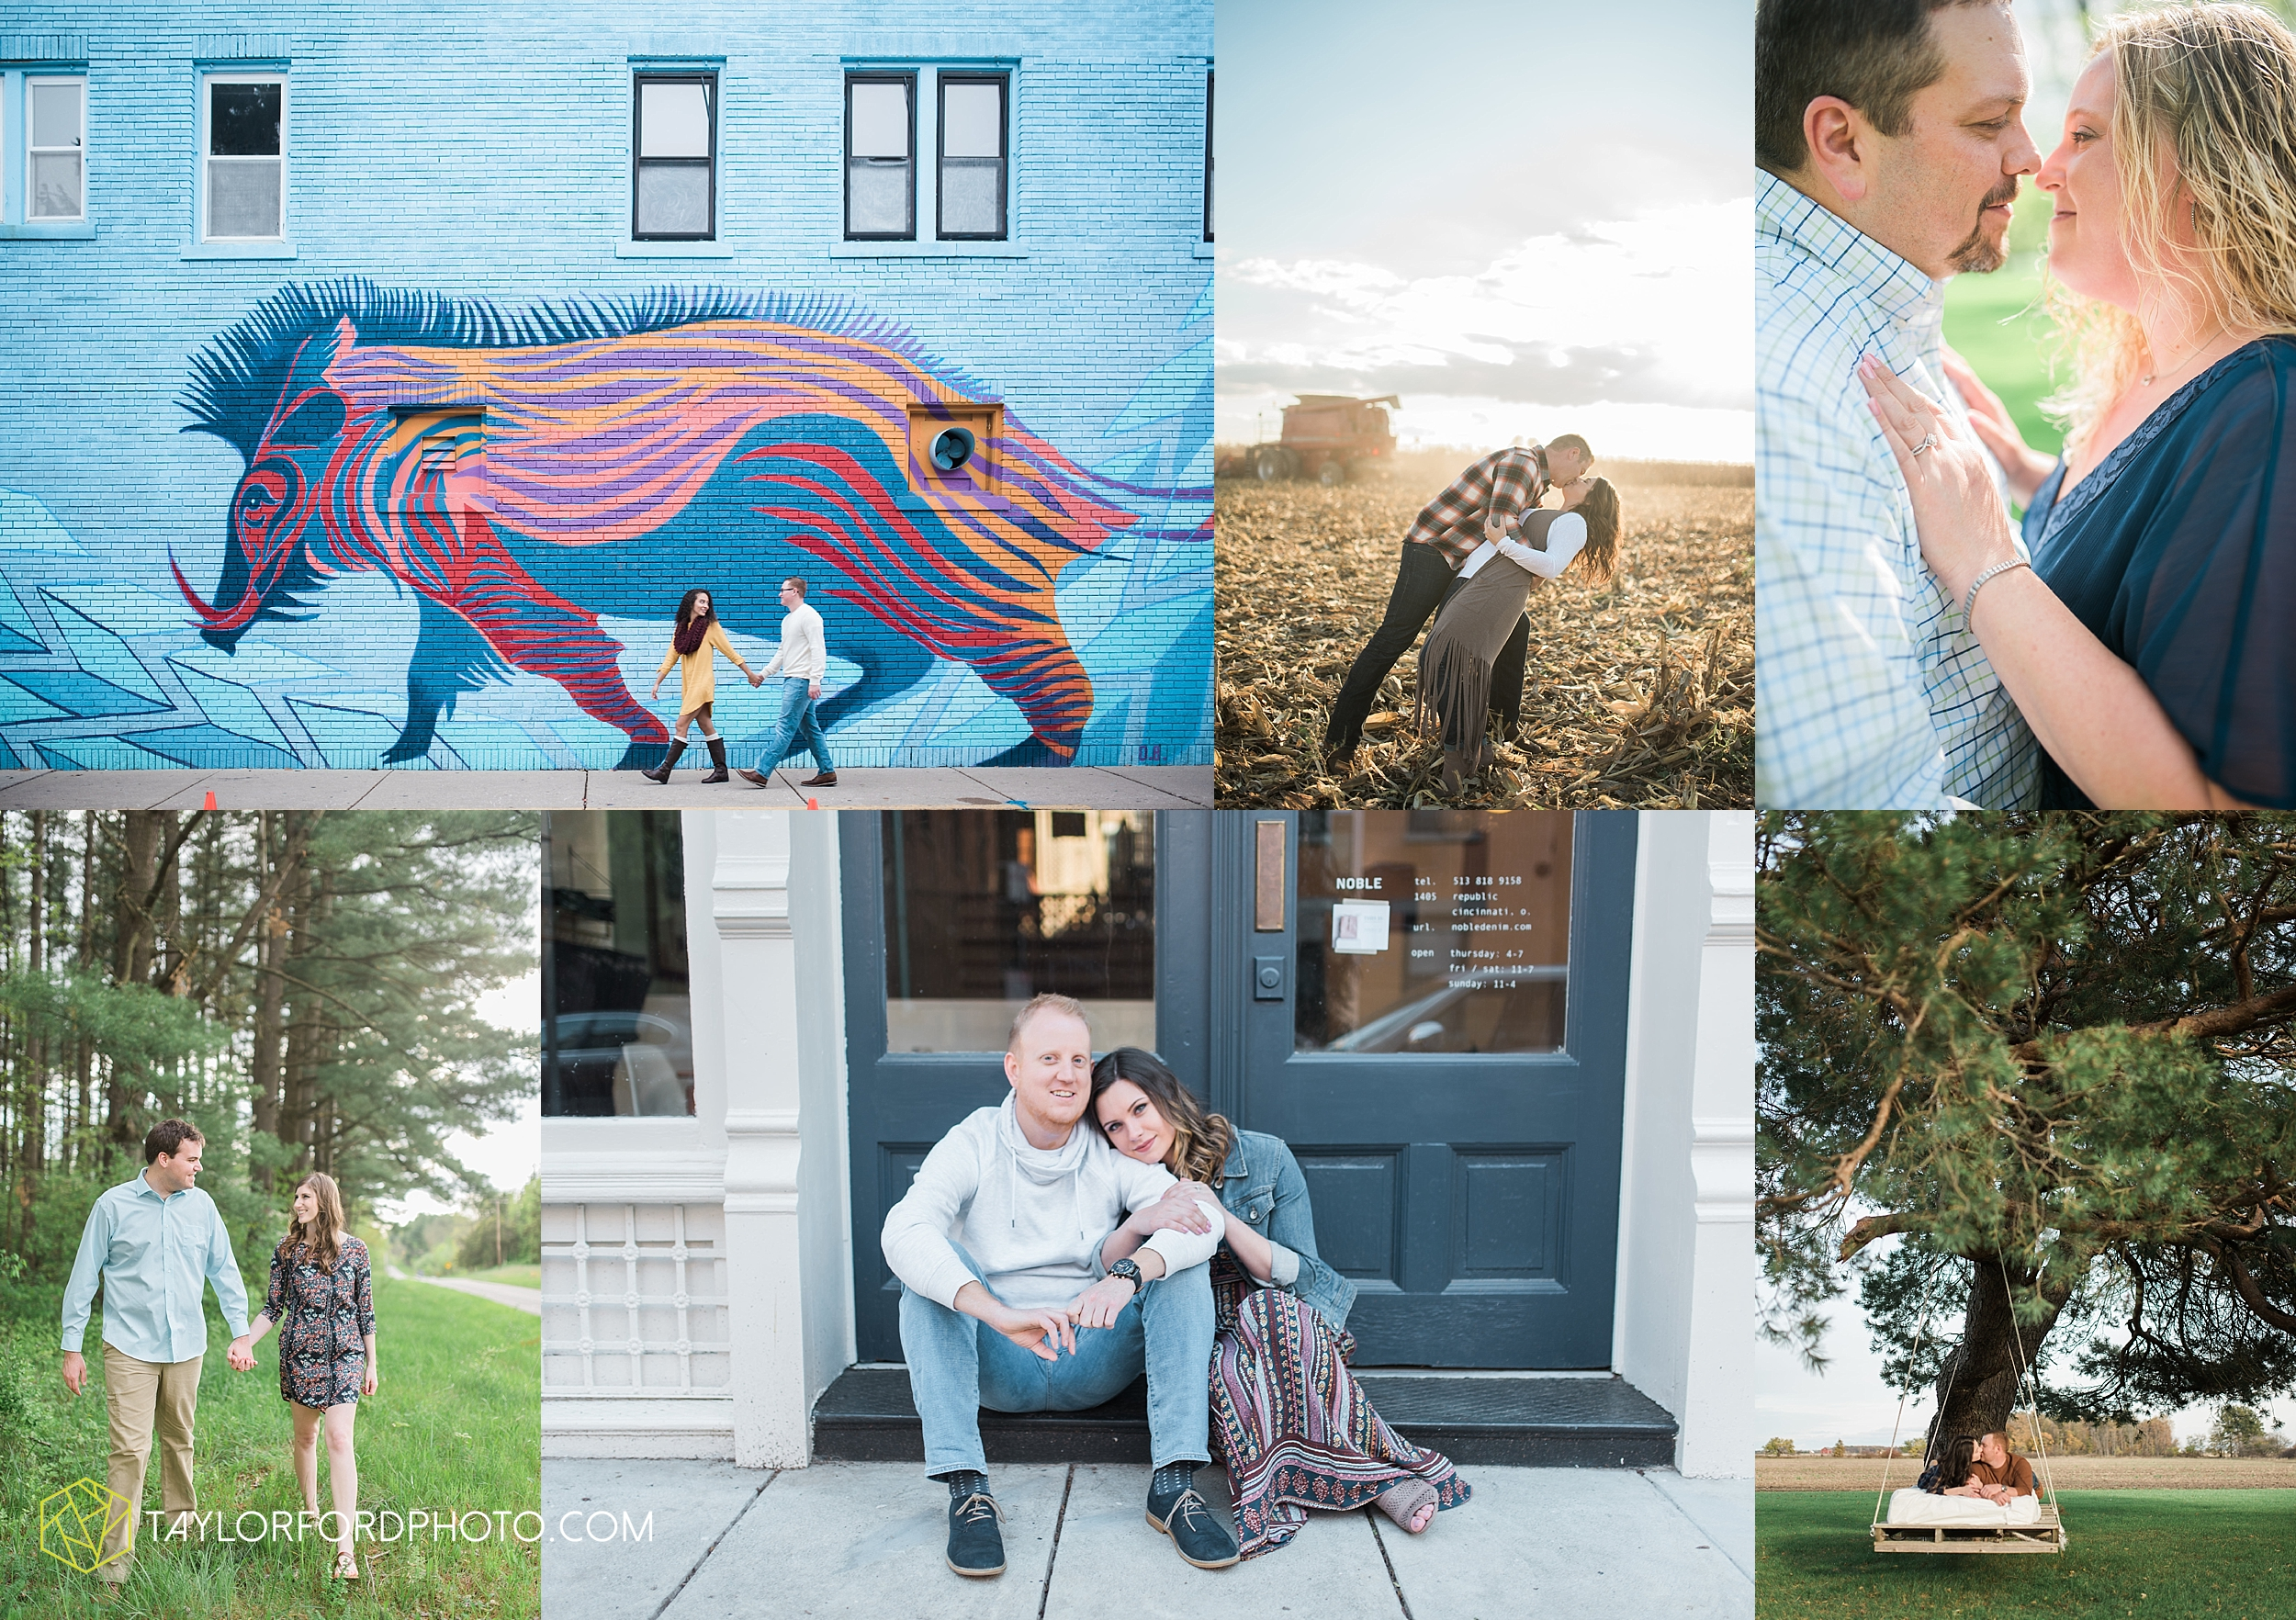 van-wert-ohio-fort-wayne-indiana-photographer-Taylor-Ford-Photography-wedding-engagement-family-senior_4415.jpg